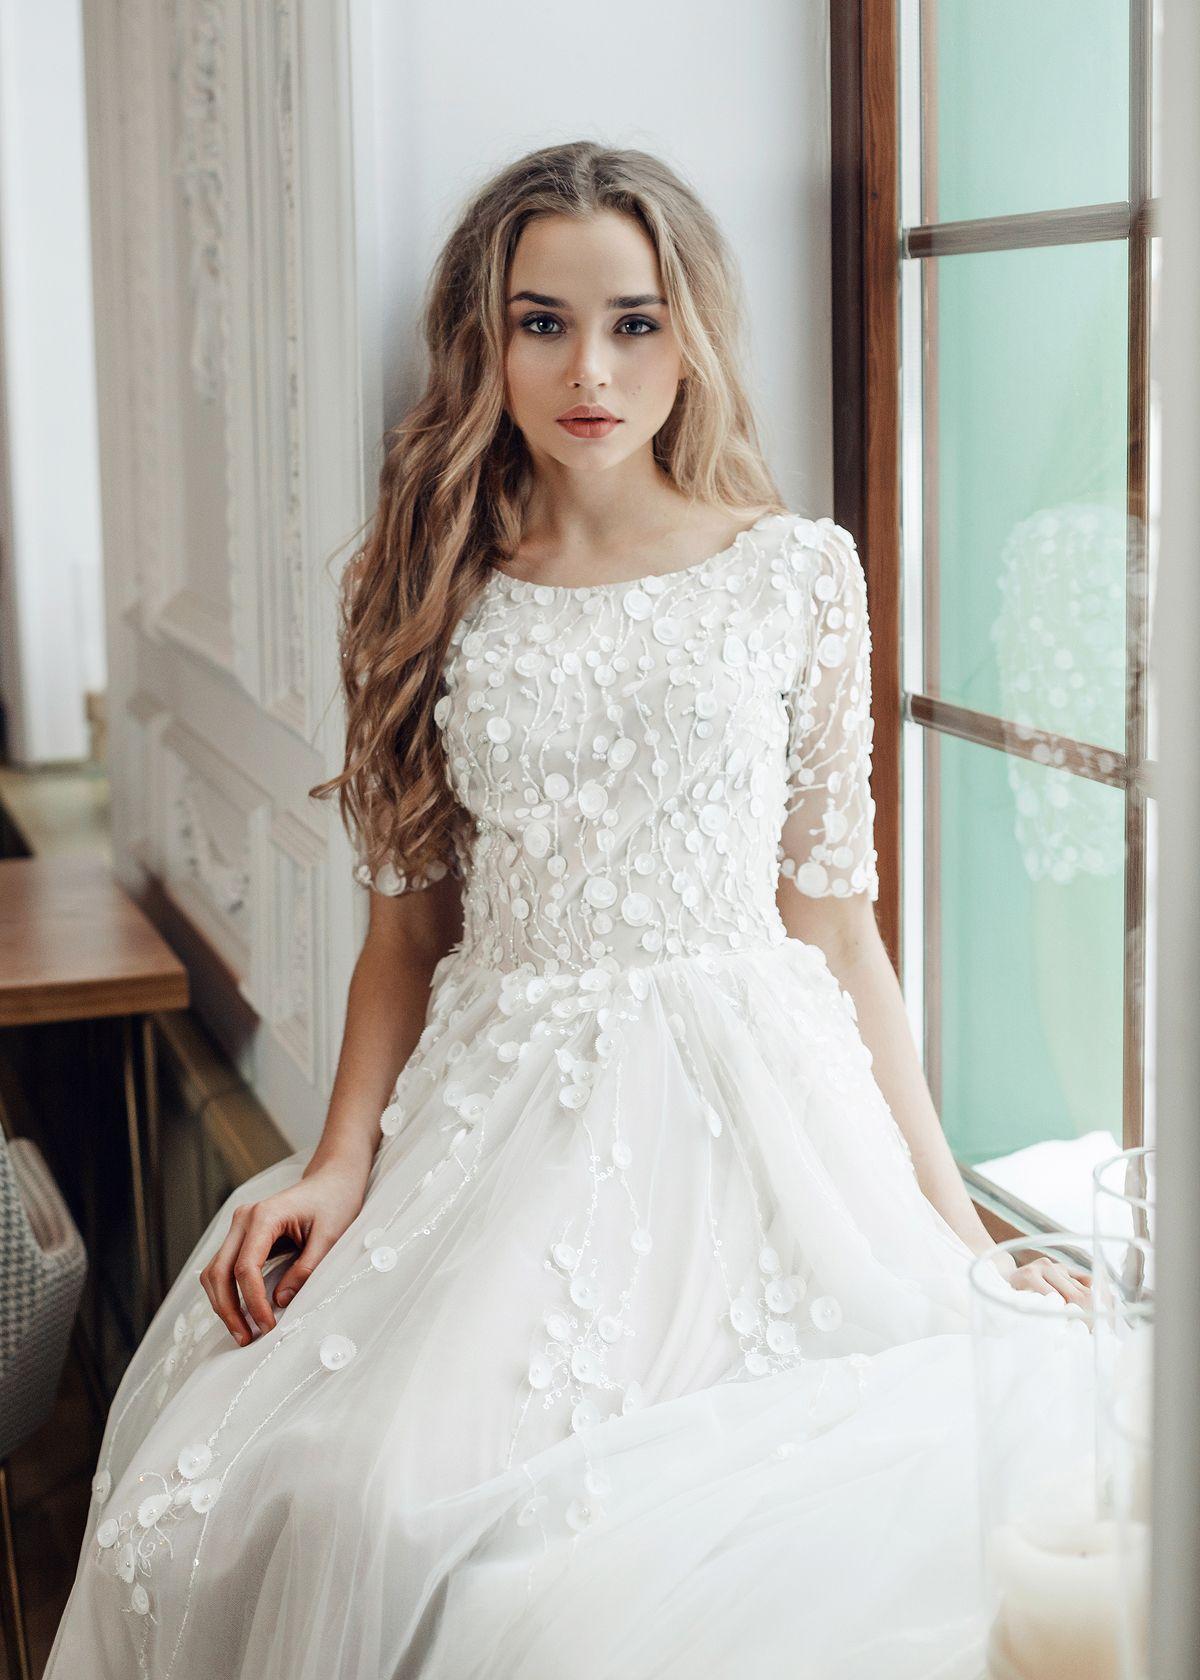 For wedding brand Esty Style